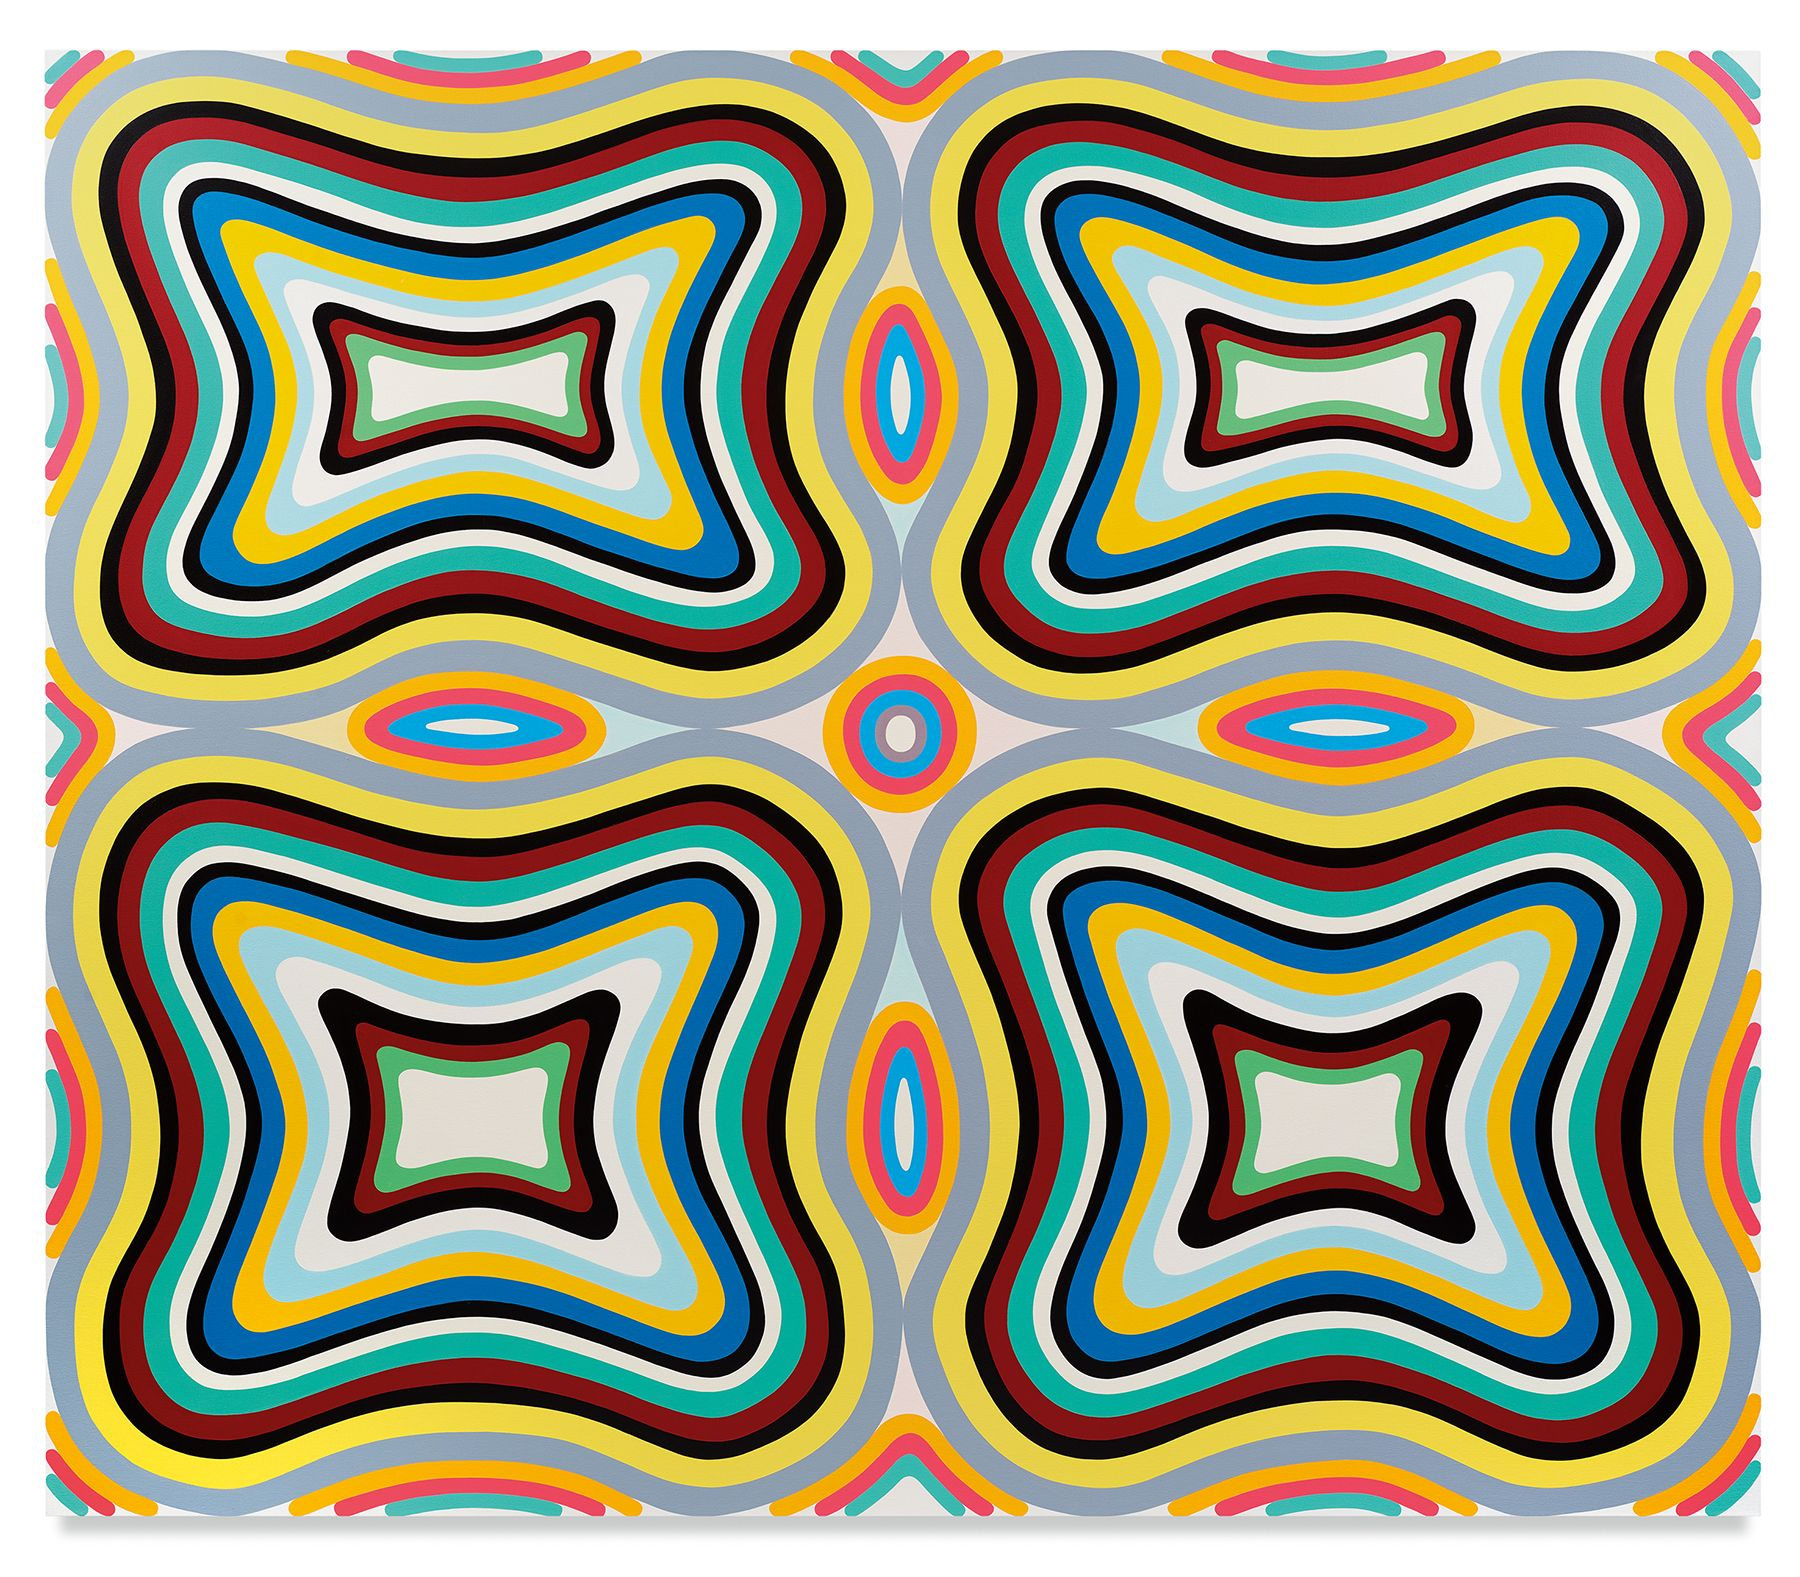 Something Strange, 2020, Oil on canvas, 65 x 76 inches, 165.1 x 193 cm,MMG#32100